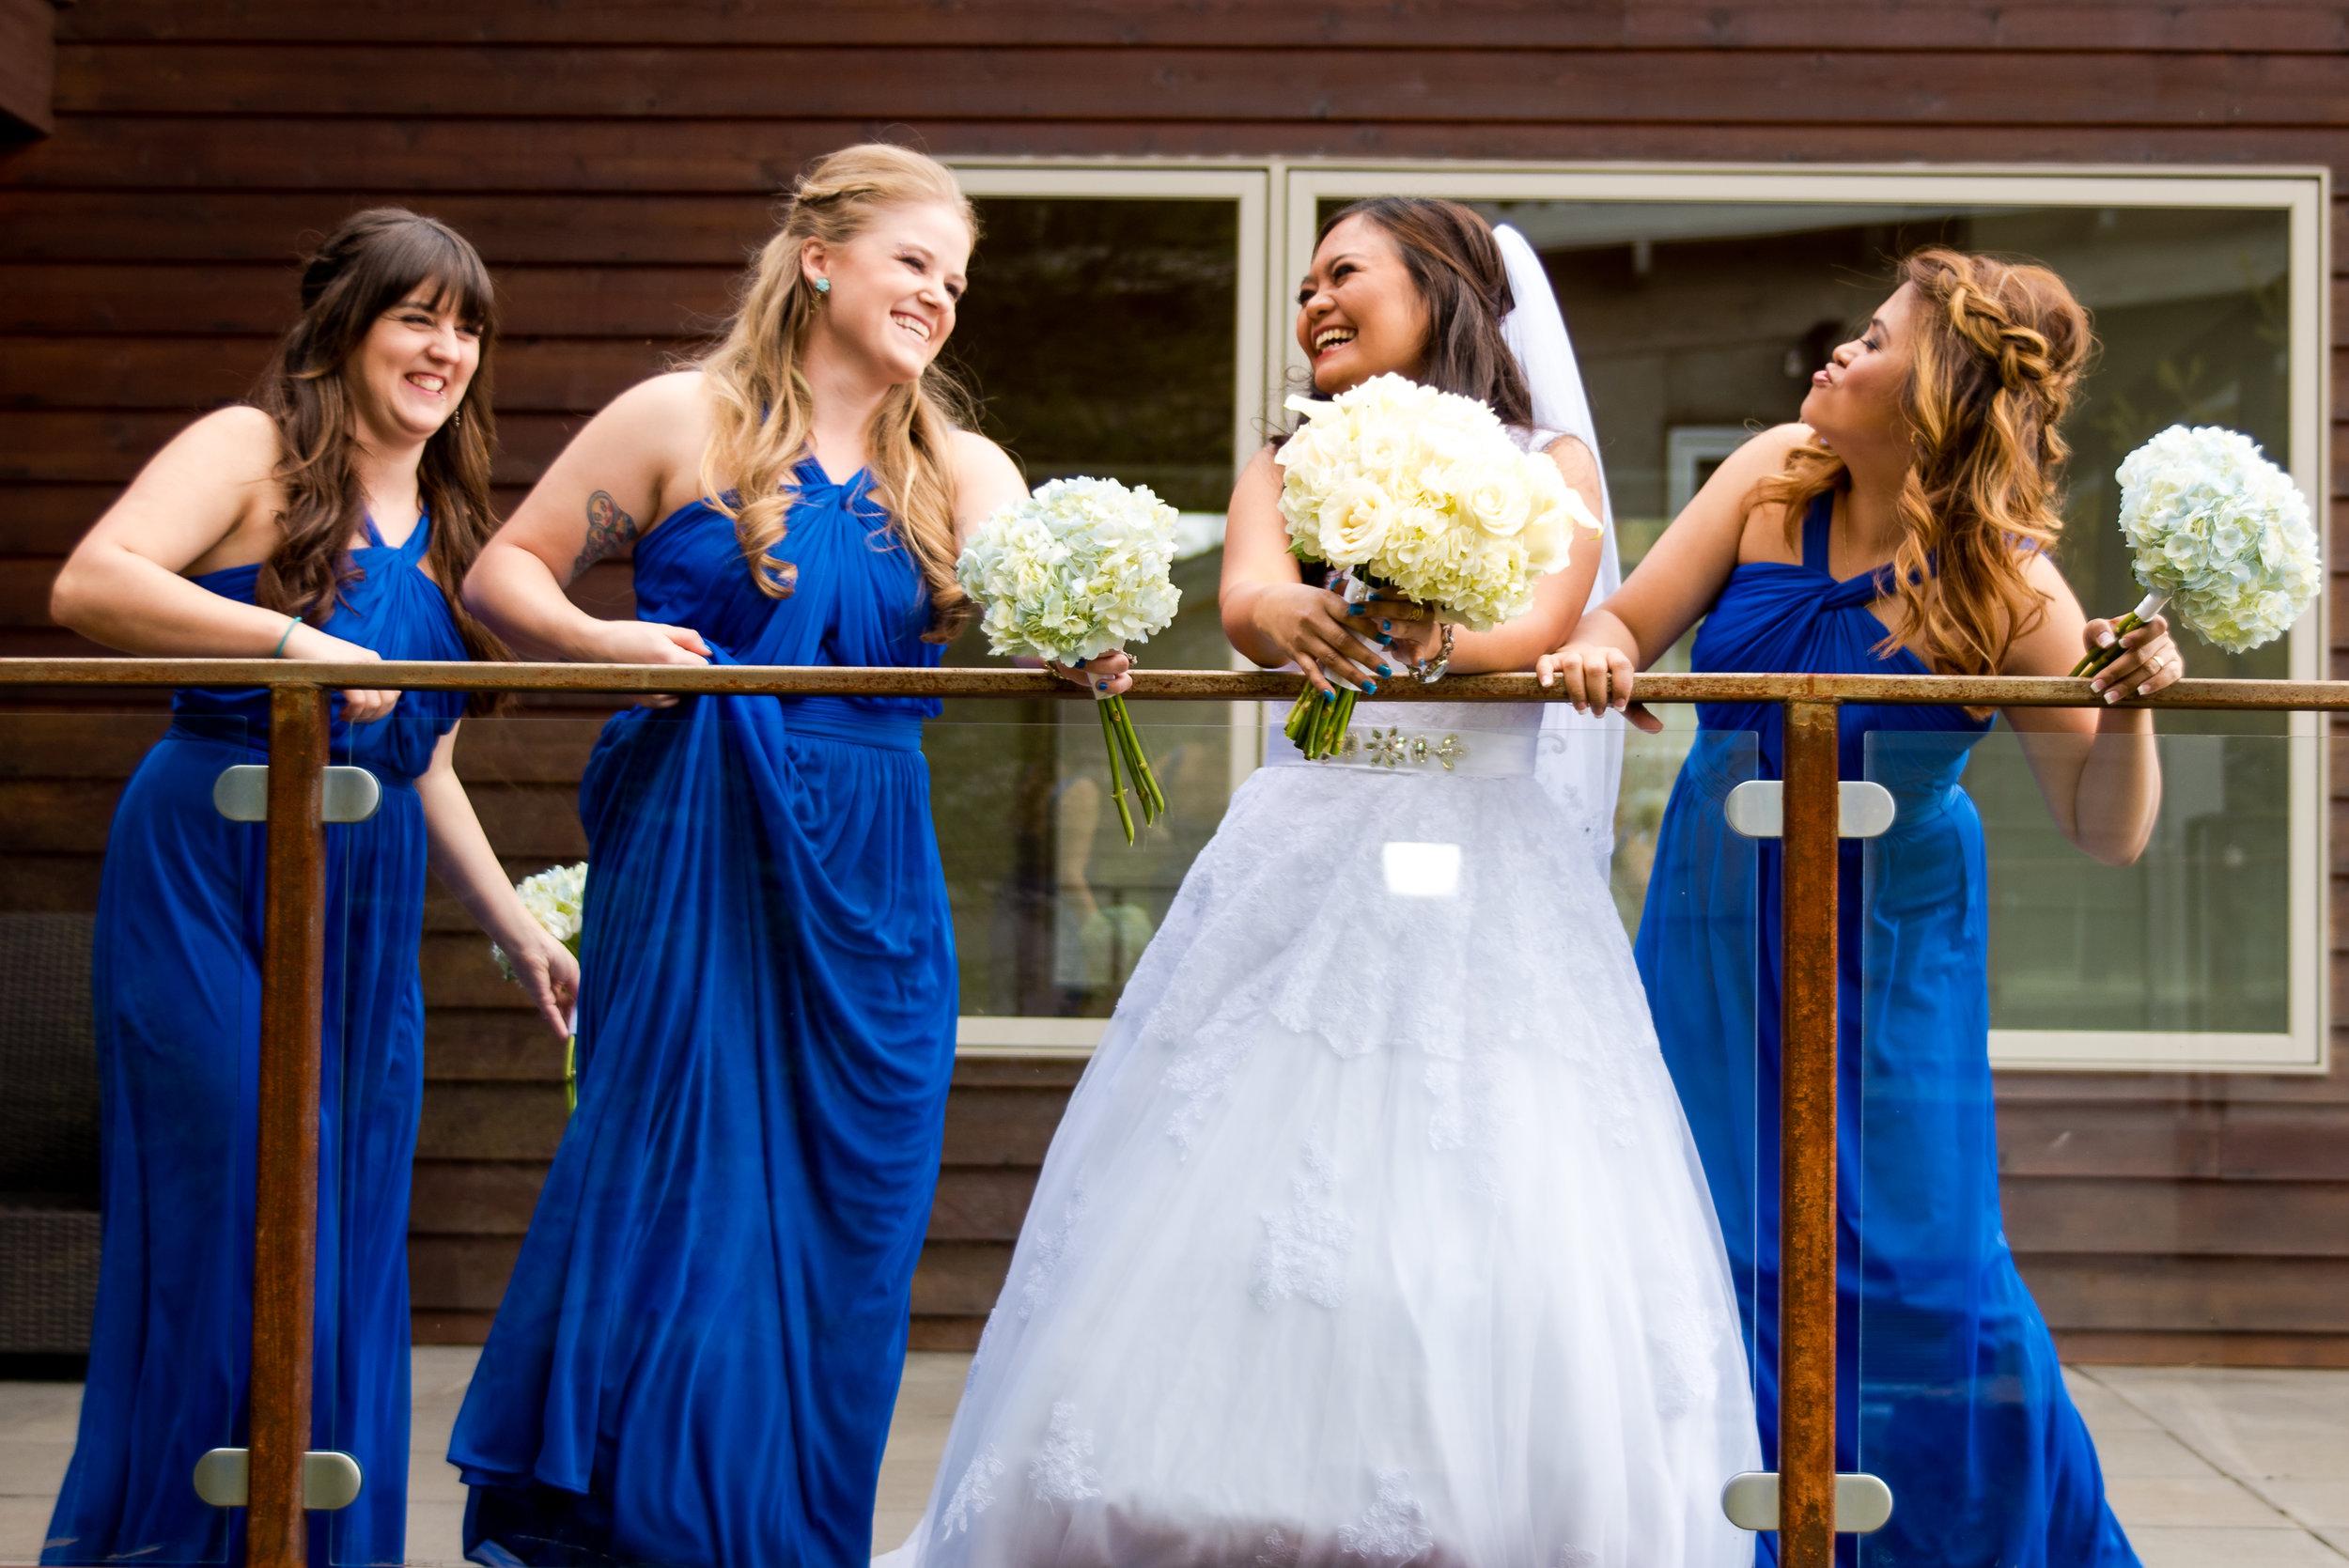 Brides maids fun (16 of 19).jpg